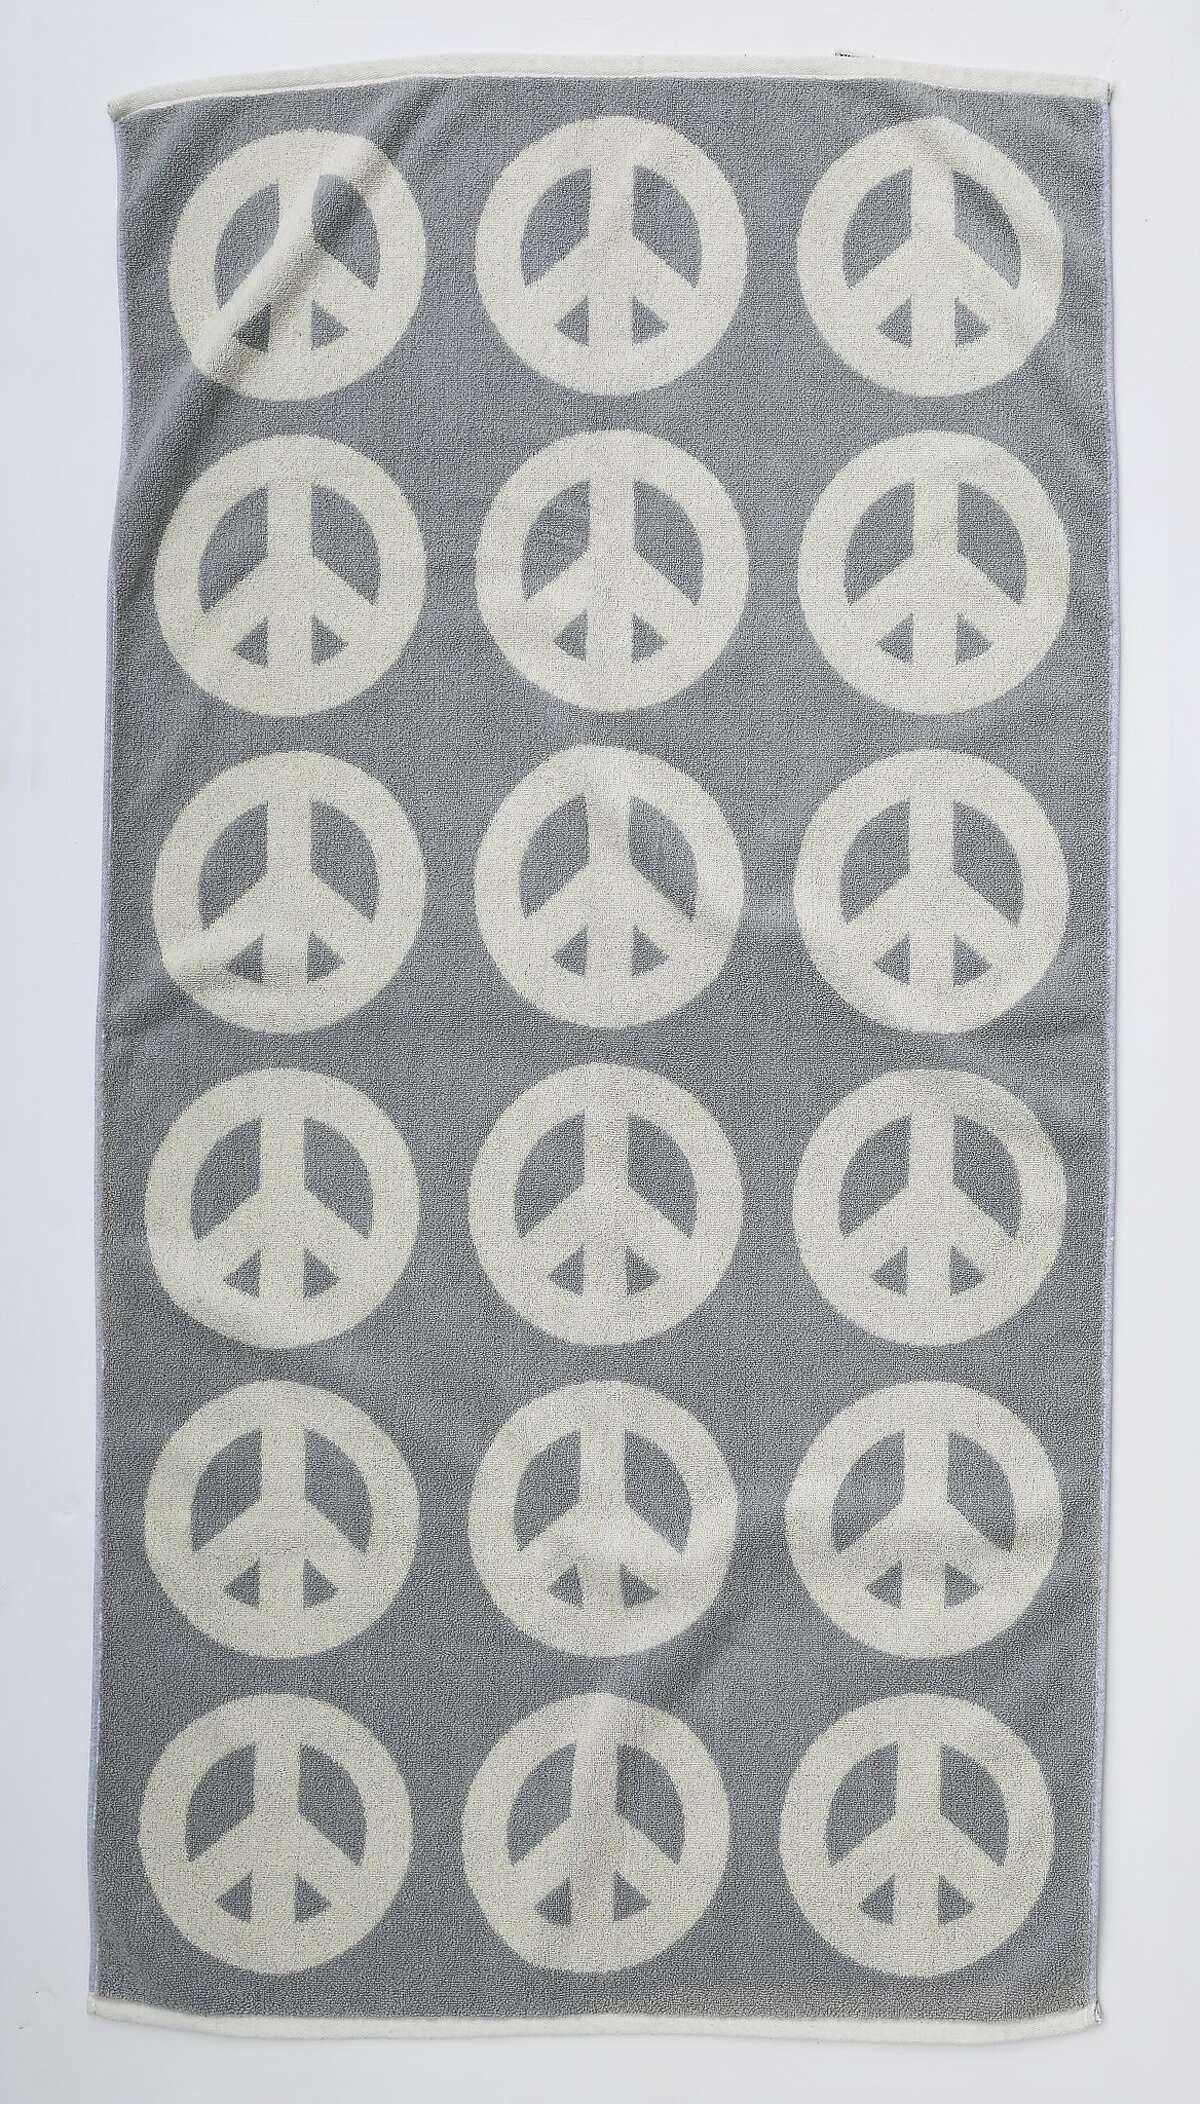 Lena Corwin - Peace Towels